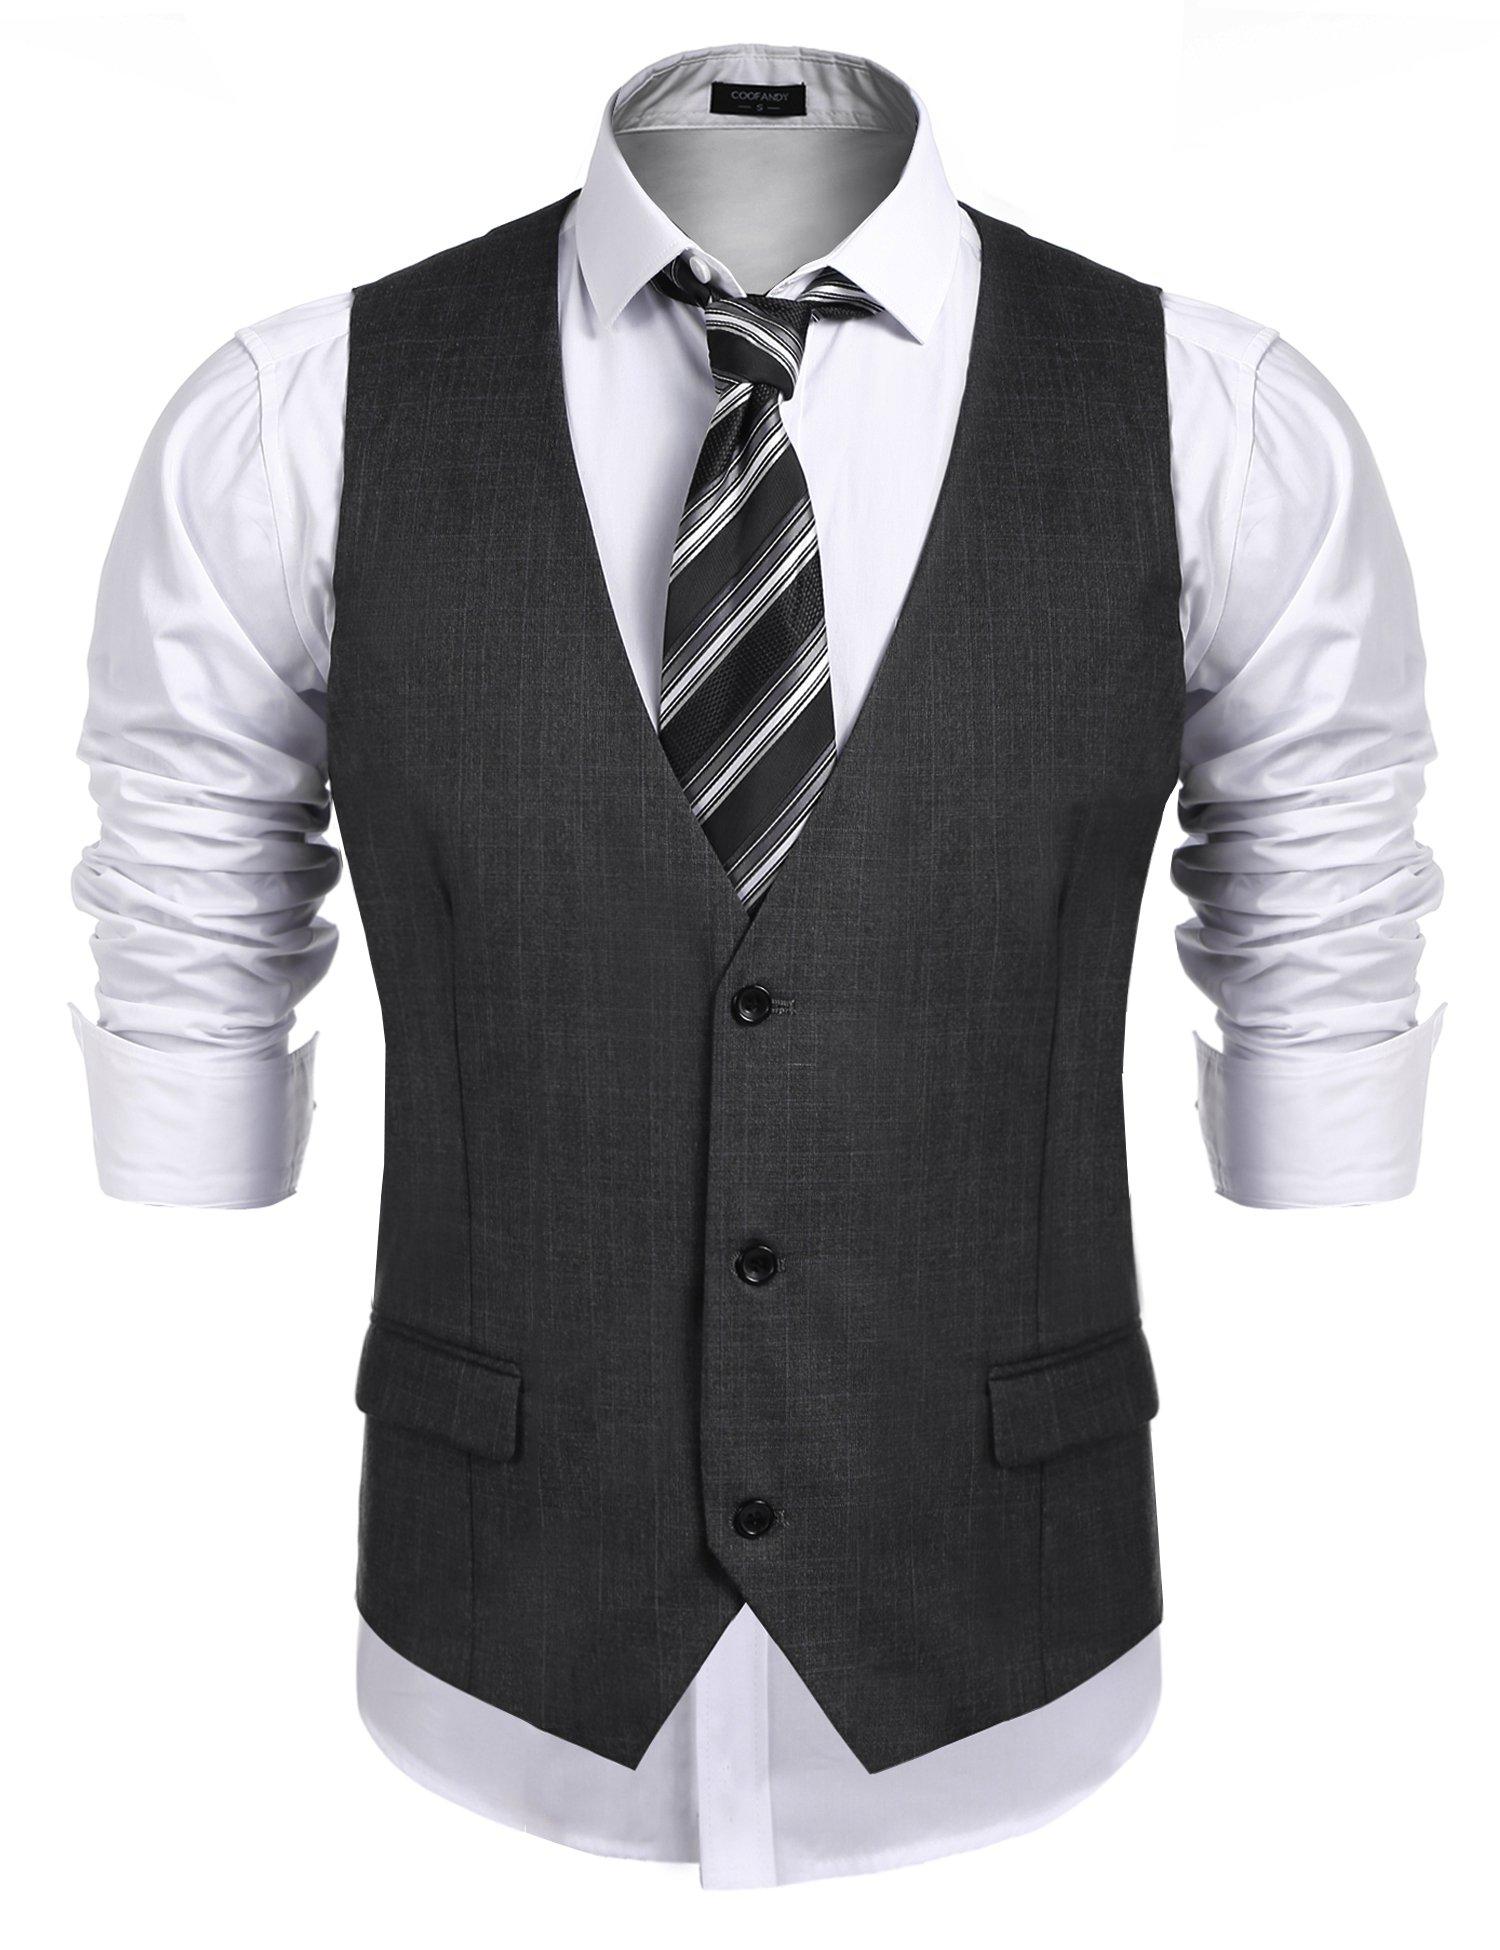 Coofandy Men's Business Suit Vest,Slim Fit Skinny Wedding Waistcoat Charcoal X-Large